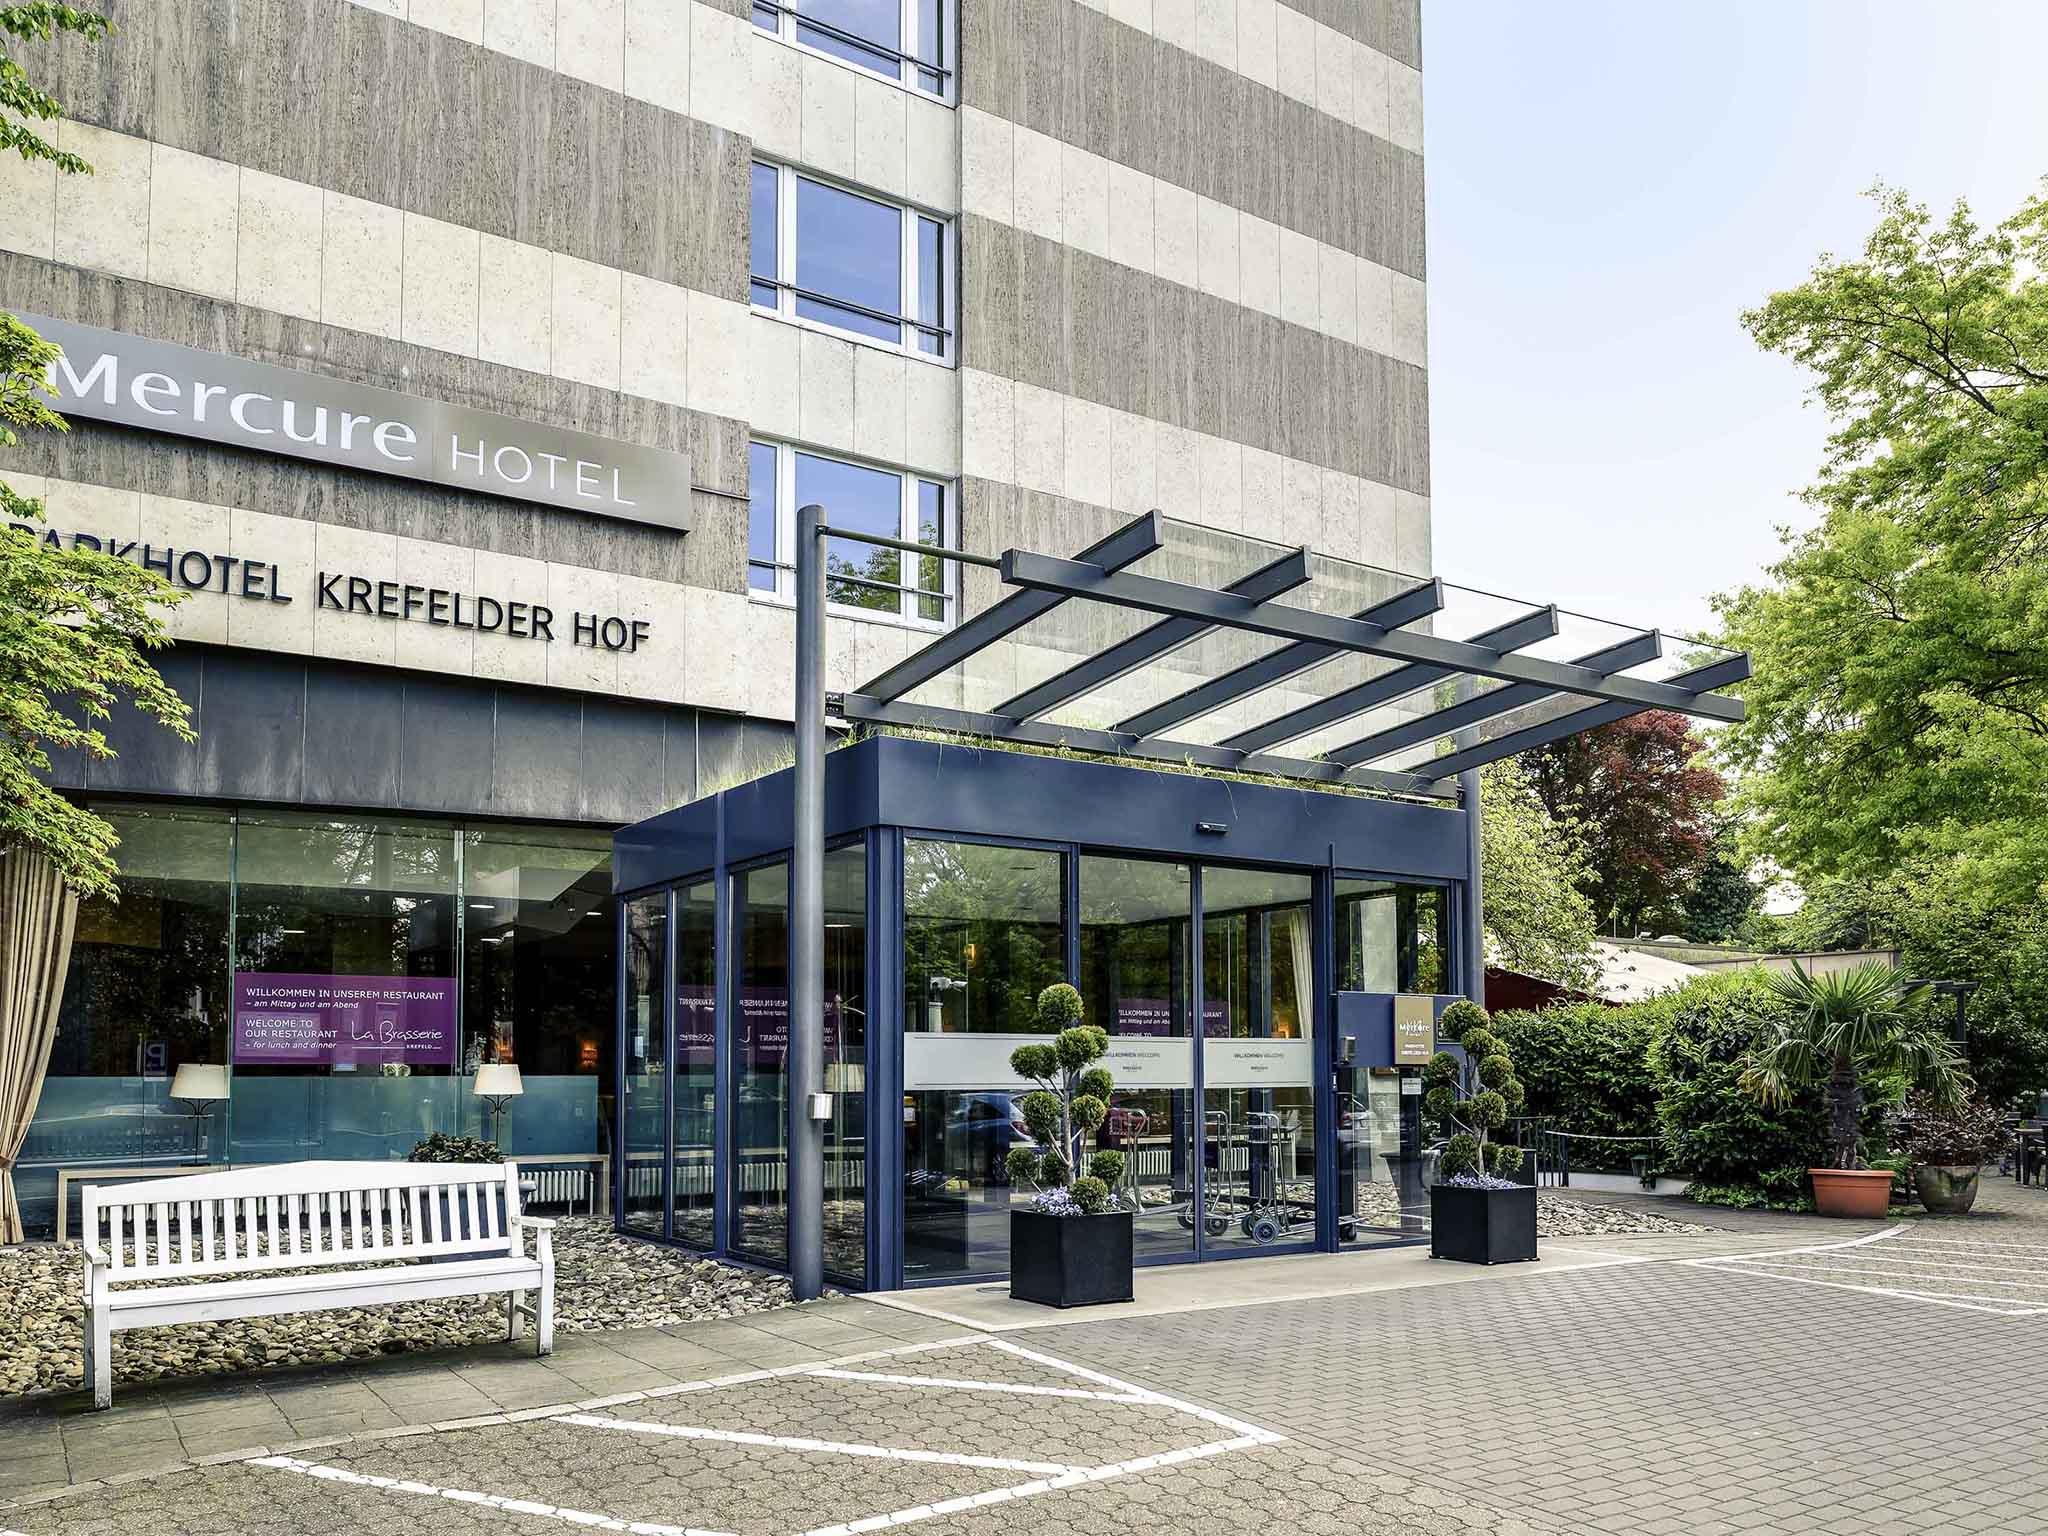 Hotel – Mercure Parkhotel Krefelder Hof